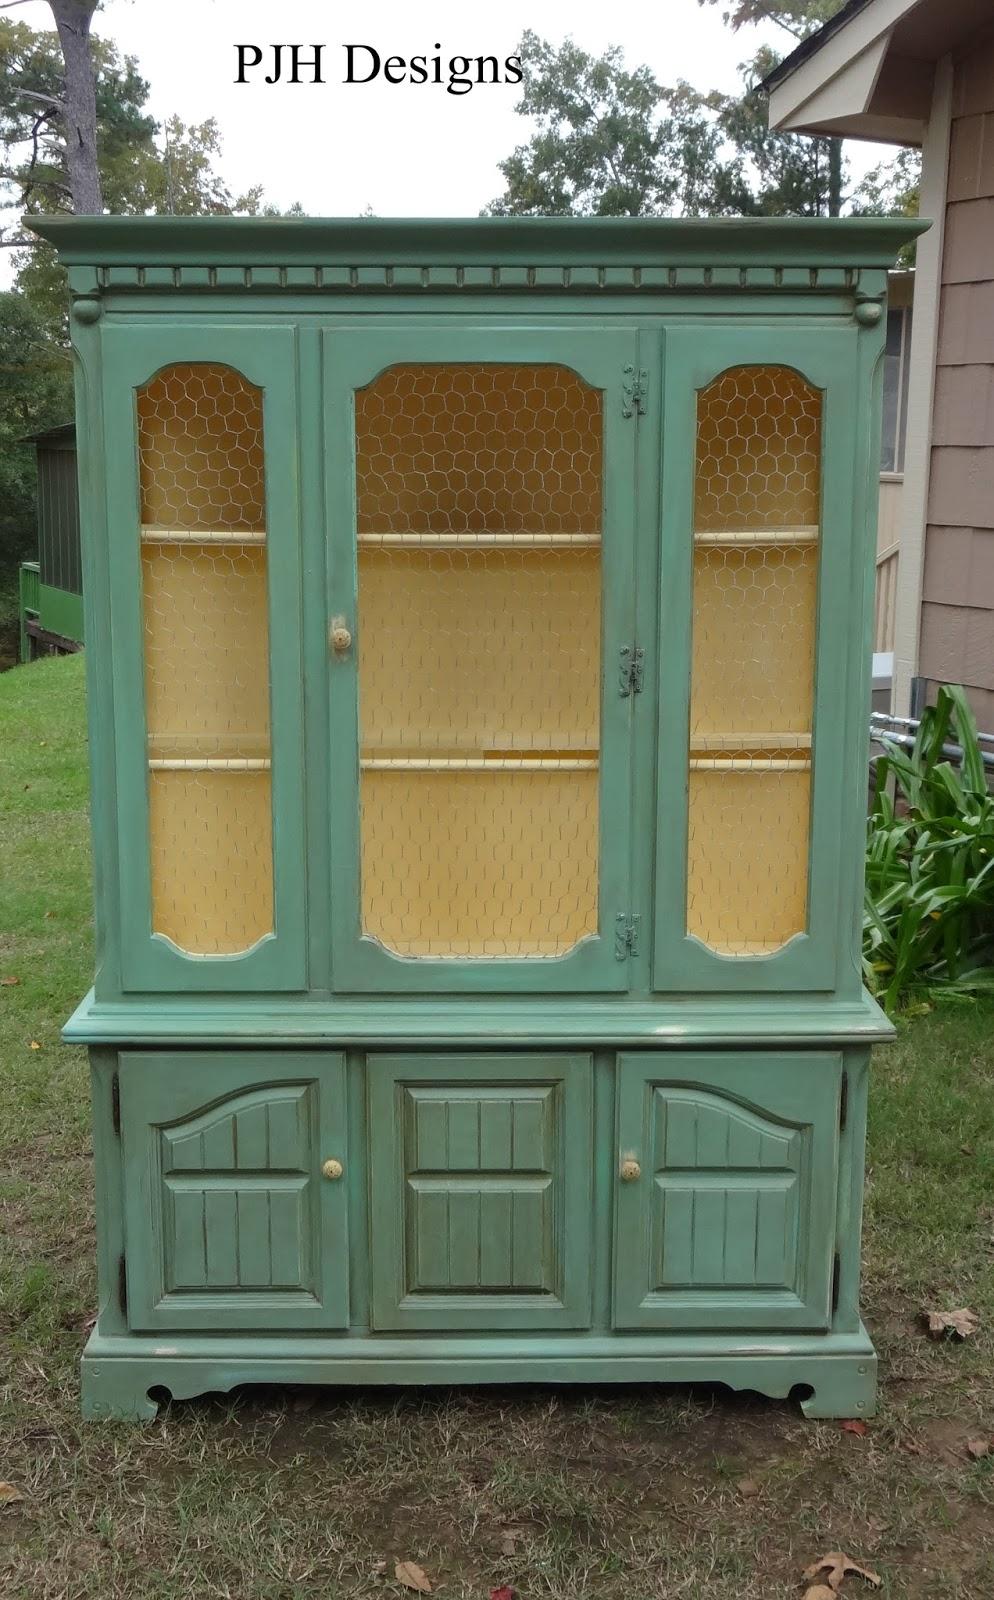 Pjh designs hand painted antique furniture free graphic for Free greene and greene furniture plans